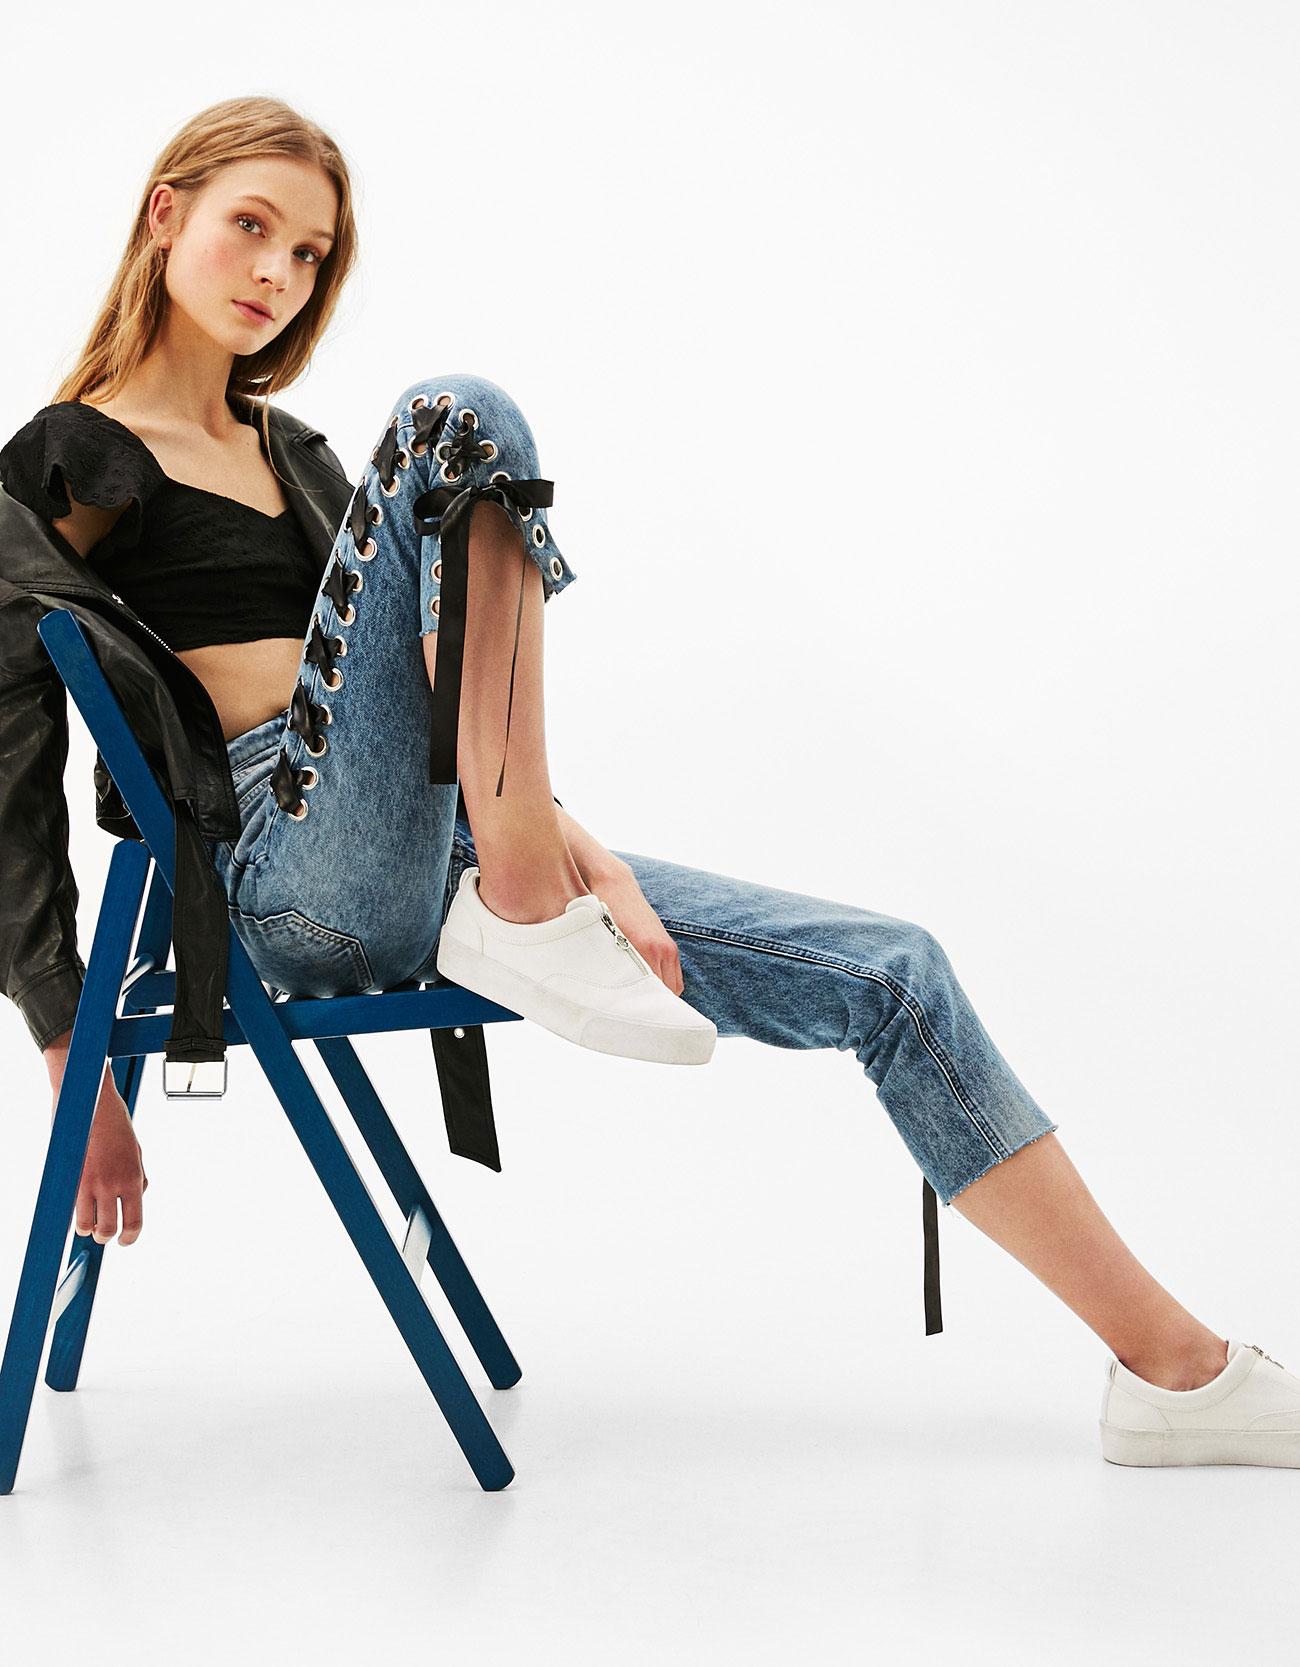 A nem mindennapi megoldás, <a href='https://www.bershka.com/hu/woman/clothes/jeans/high-waist-jeans-with-tie-c1010193215p100904029.html?colorId=428' target='_blank'>Bershka</a></p>